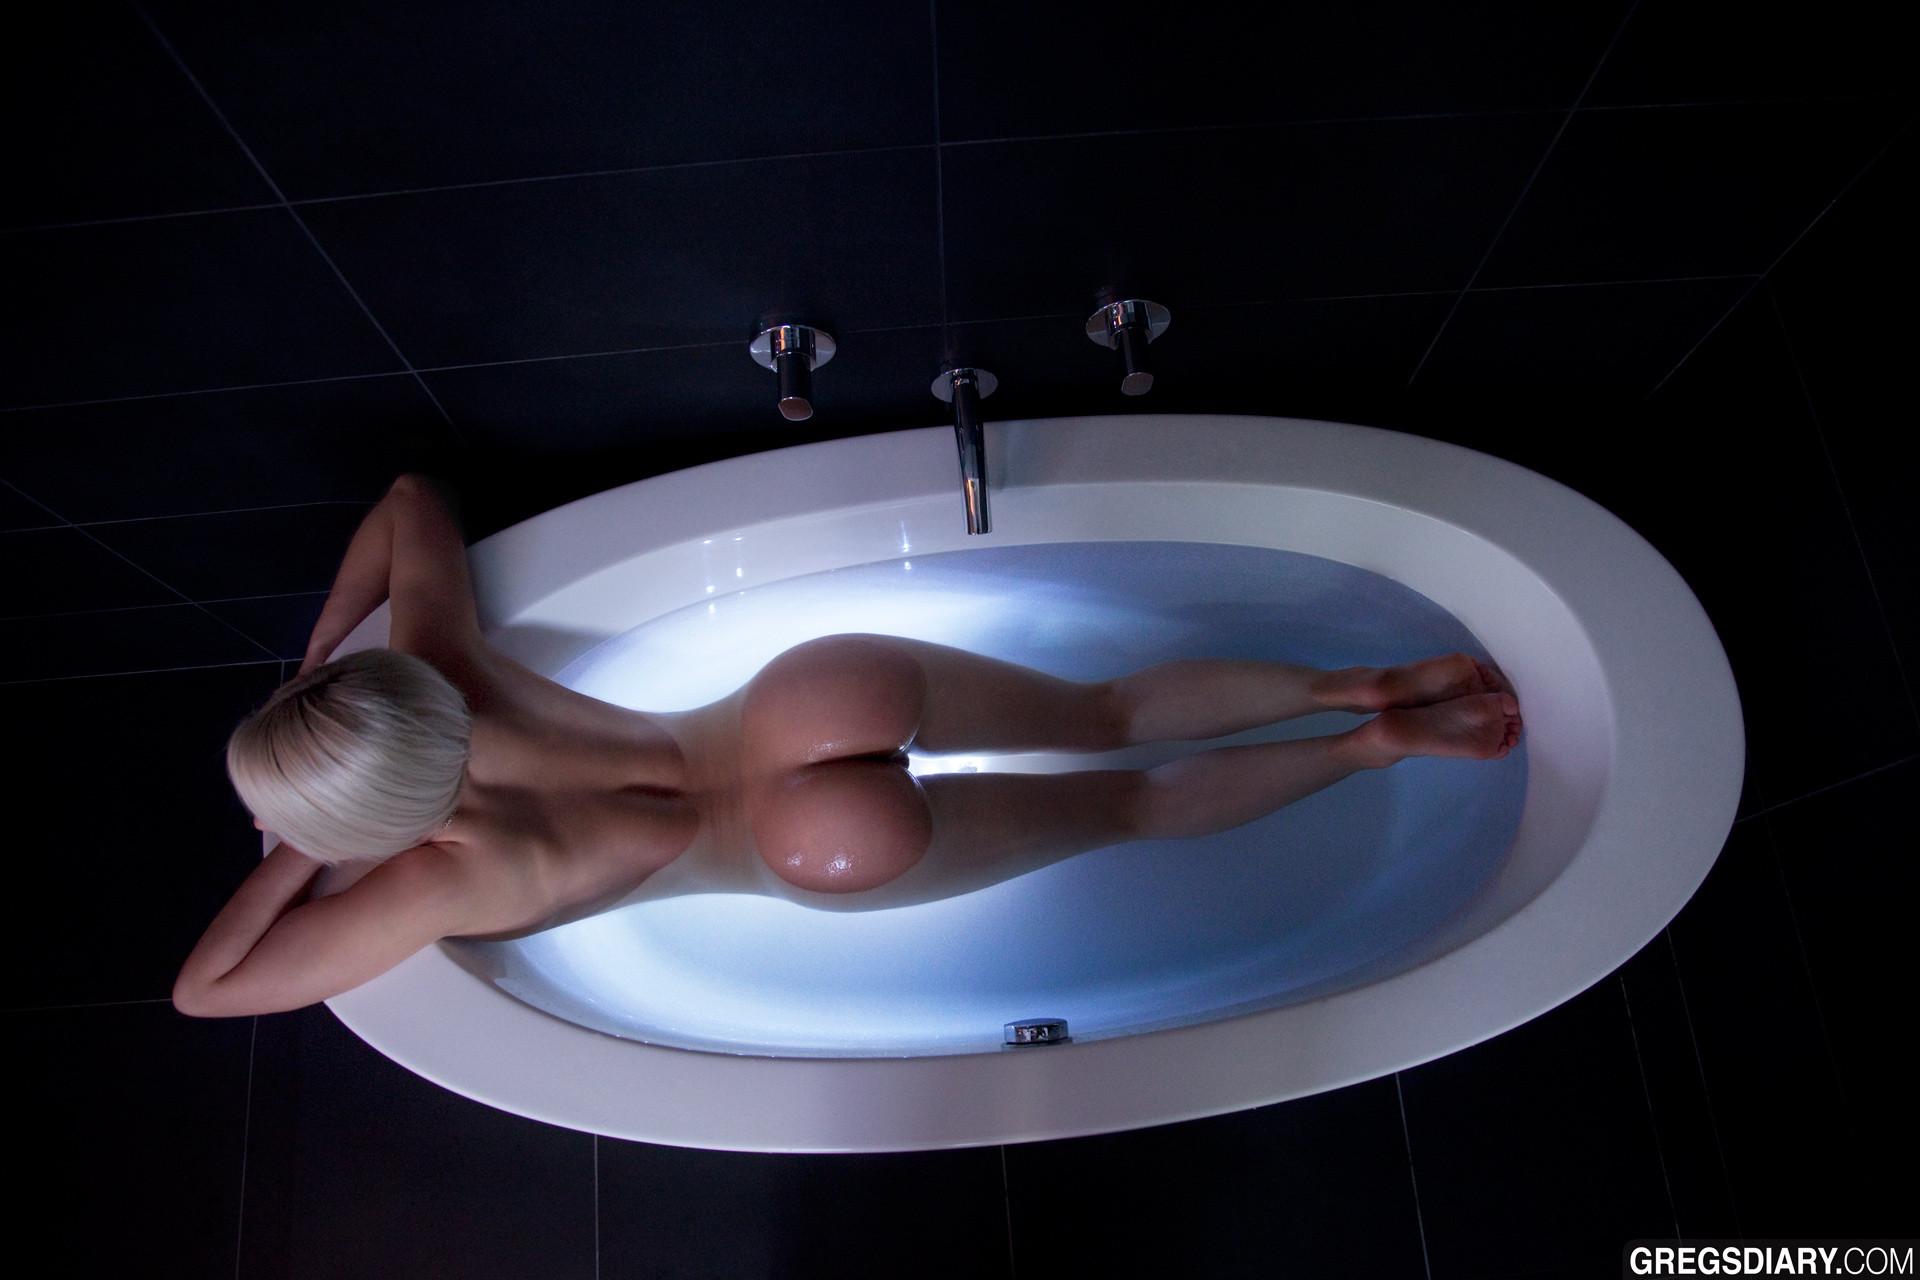 perfect ass in bathtub